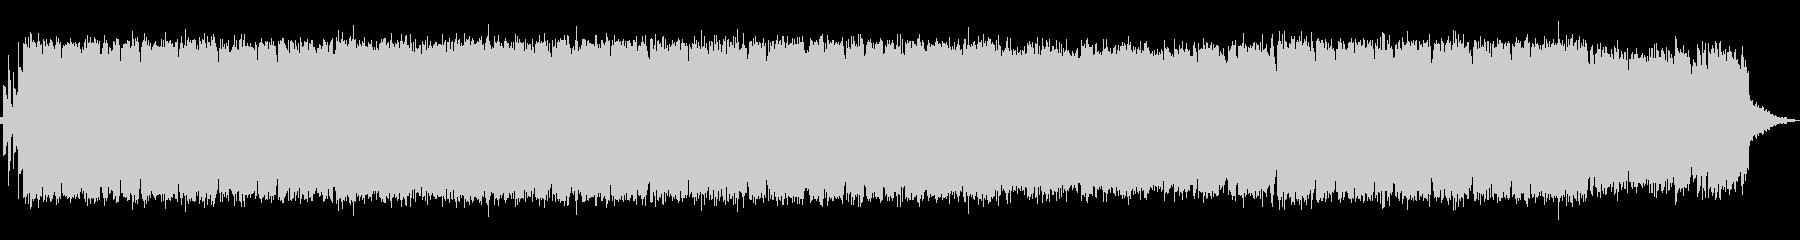 AMAZING GRACEのギター演奏曲の未再生の波形